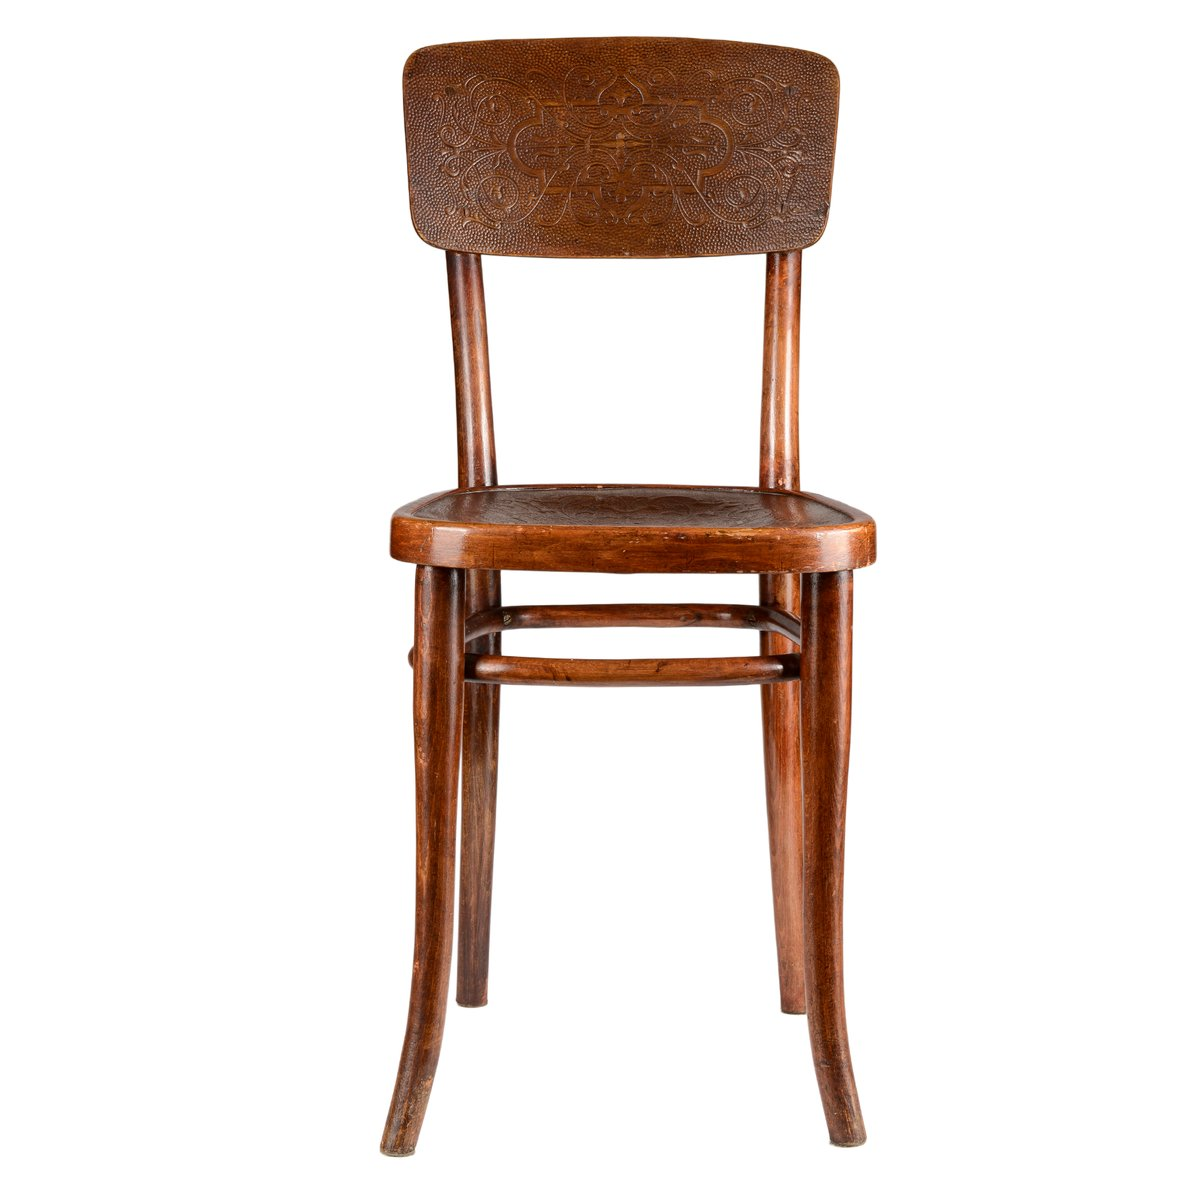 Printed U0026 Decorated Wooden Chair From Gebrüder Thonet Vienna GmbH, 1920s